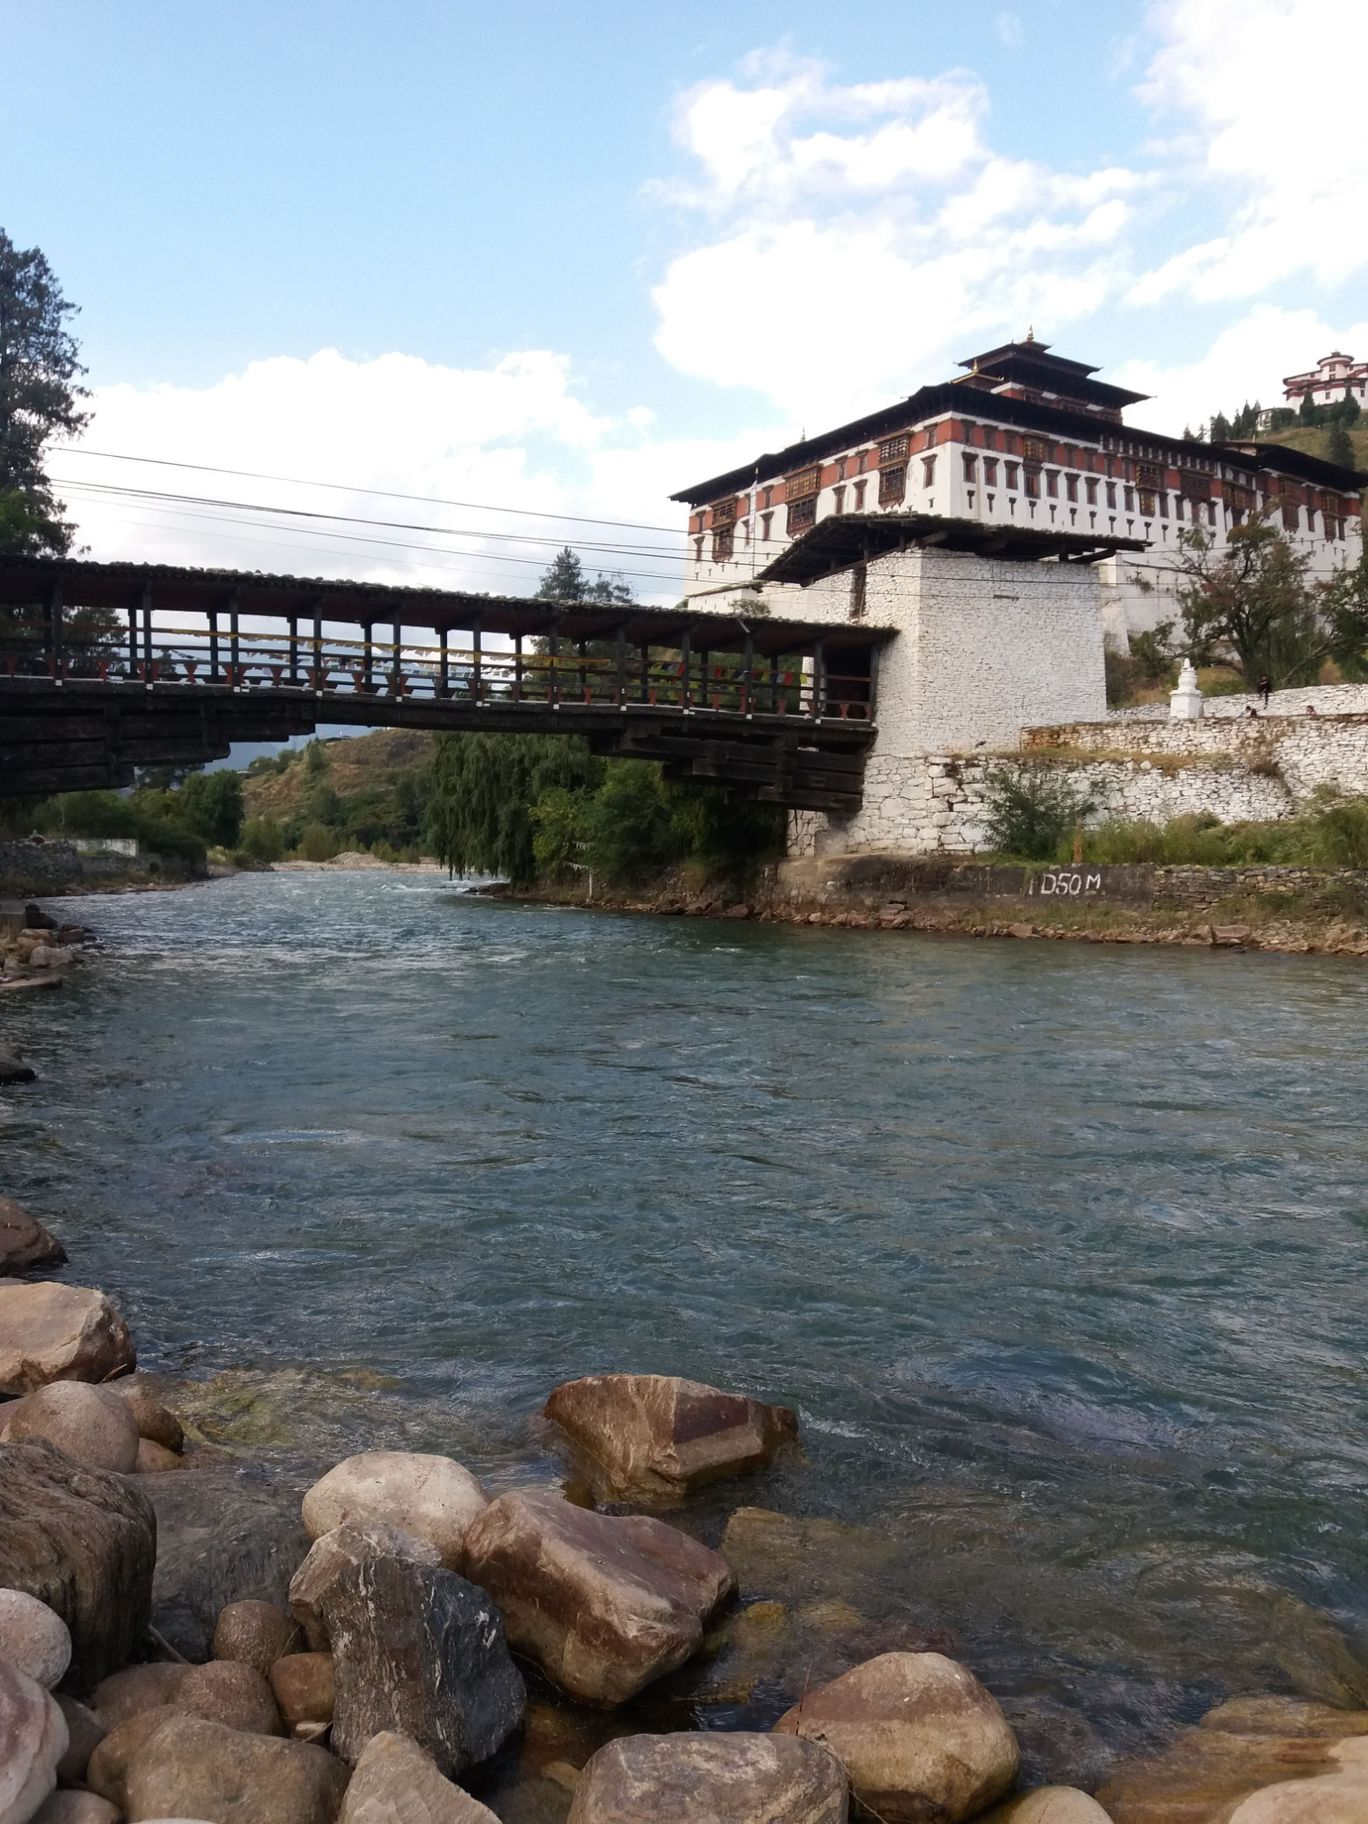 Photo of Bhutan By Shanmuga Priya